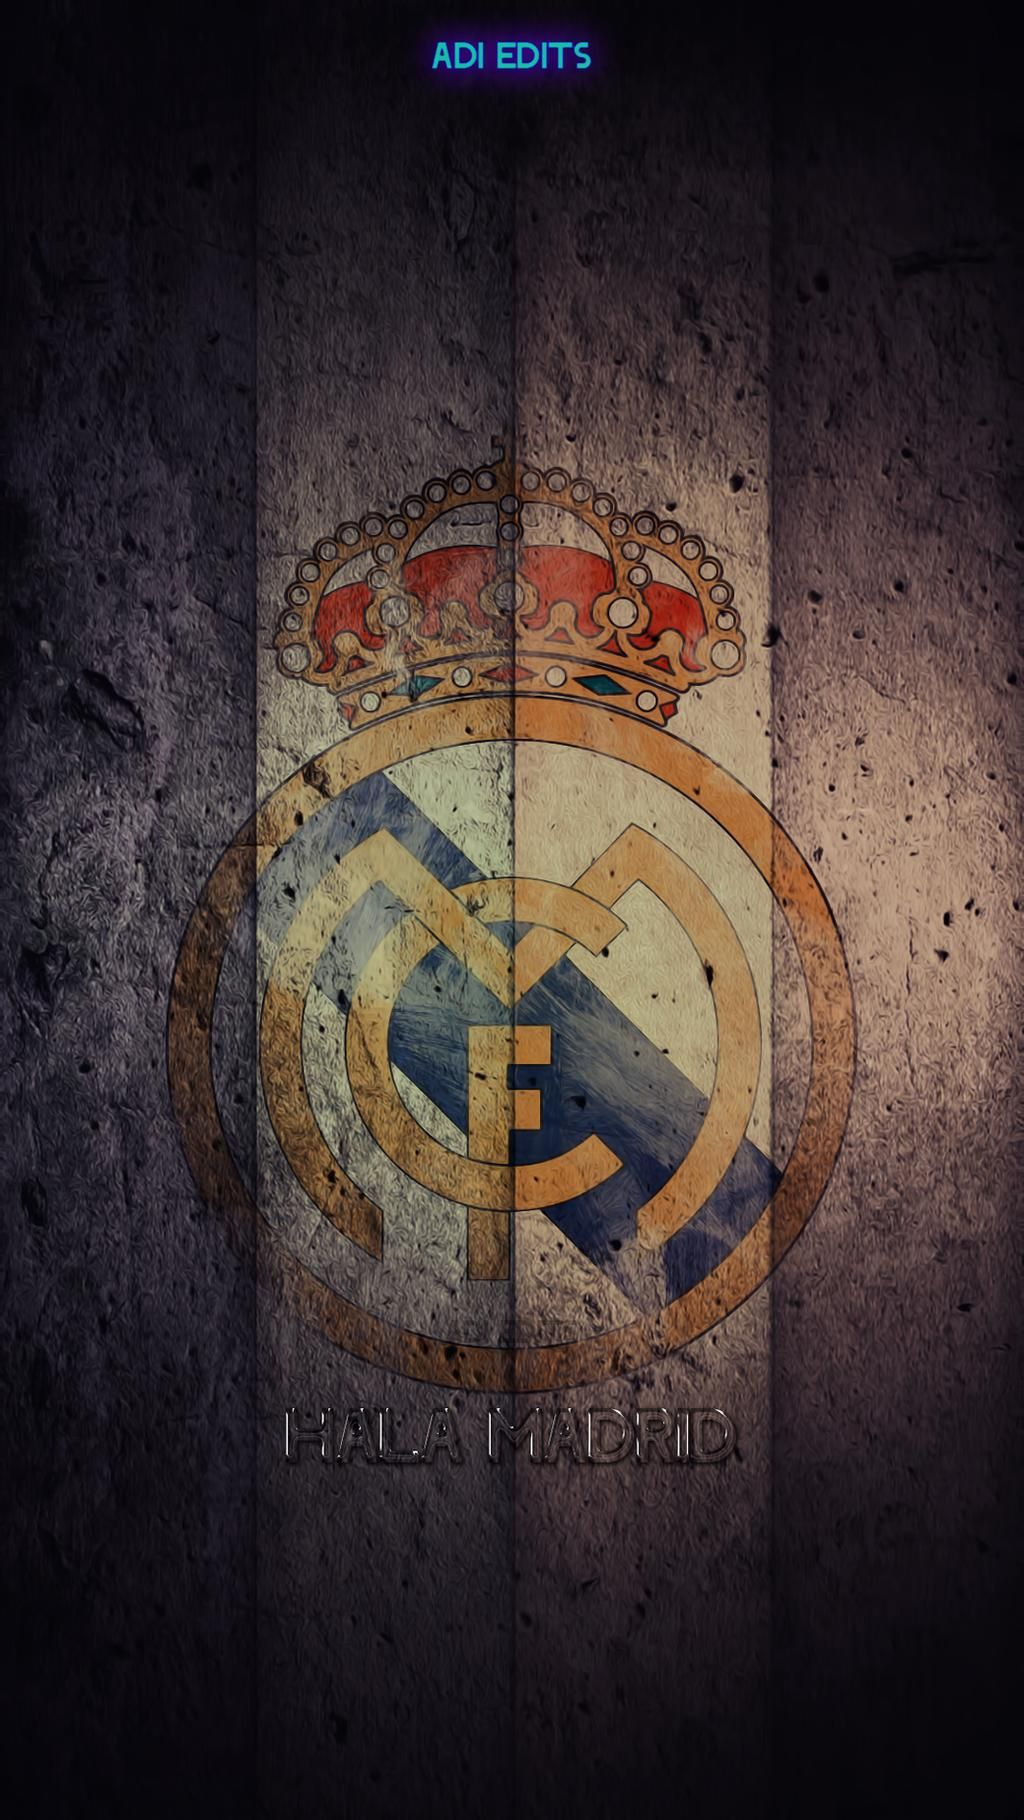 Lock Screen Real Madrid Wallpaper Iphone Hd Football in